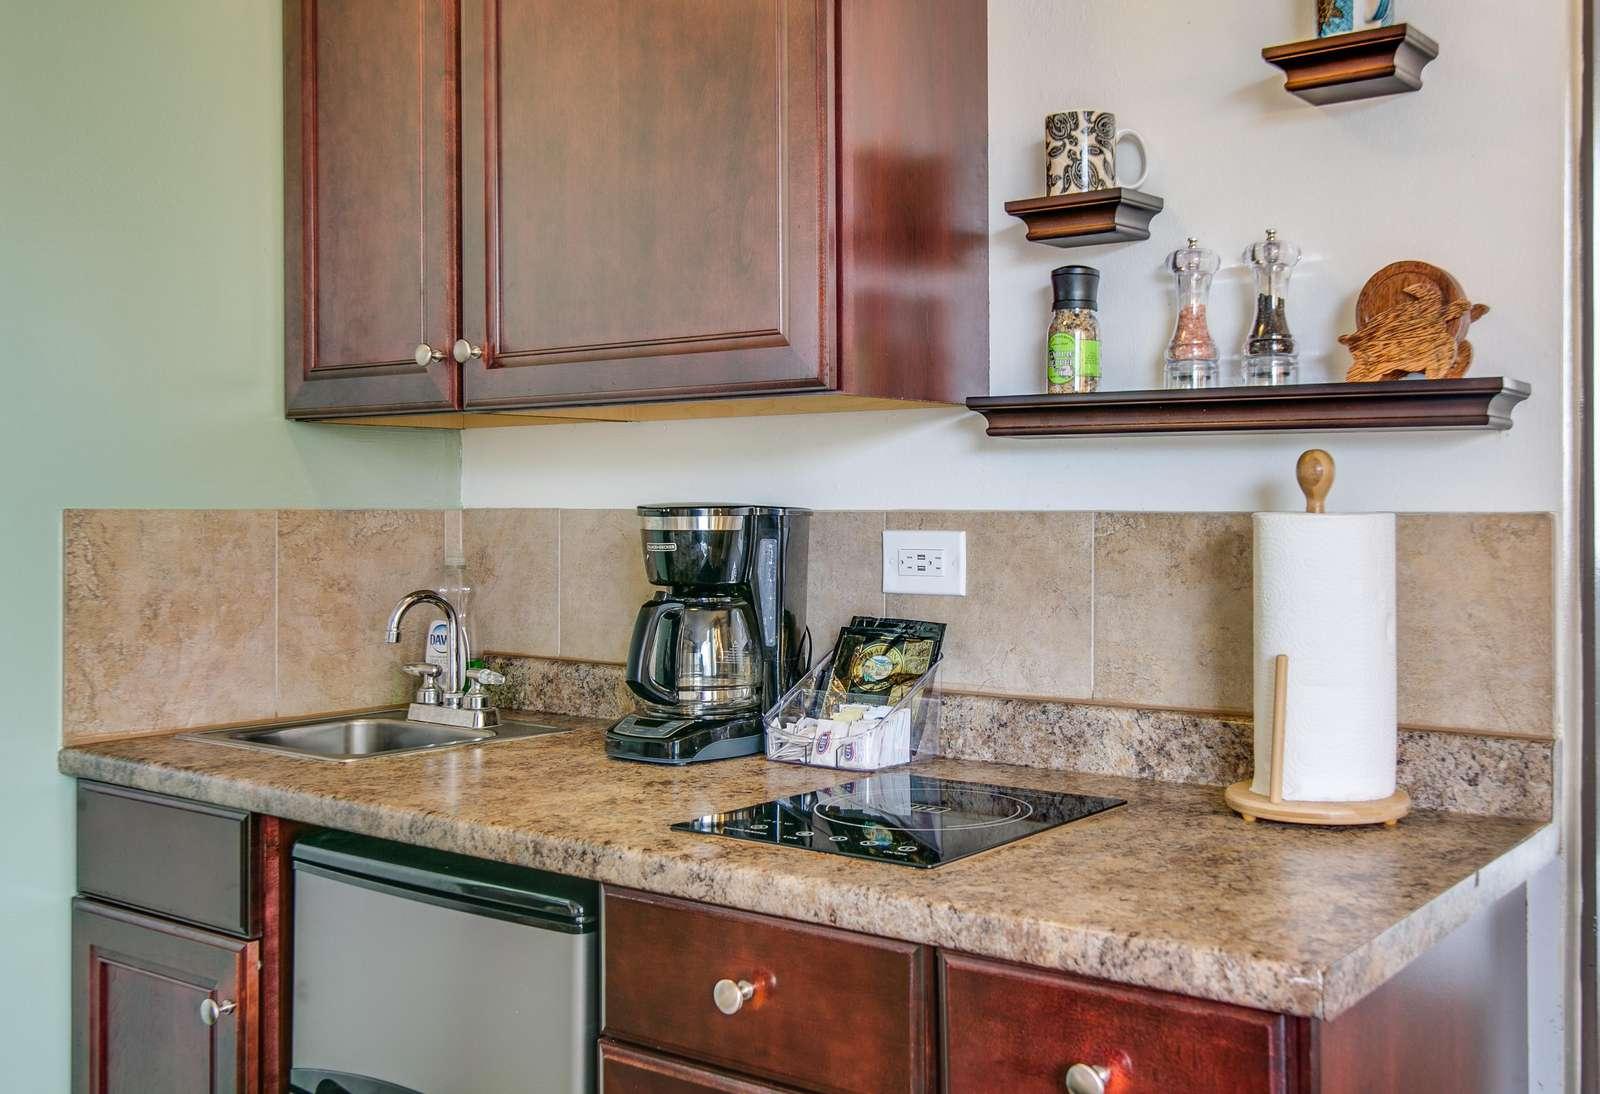 Granite counter over fridge and utensil storage